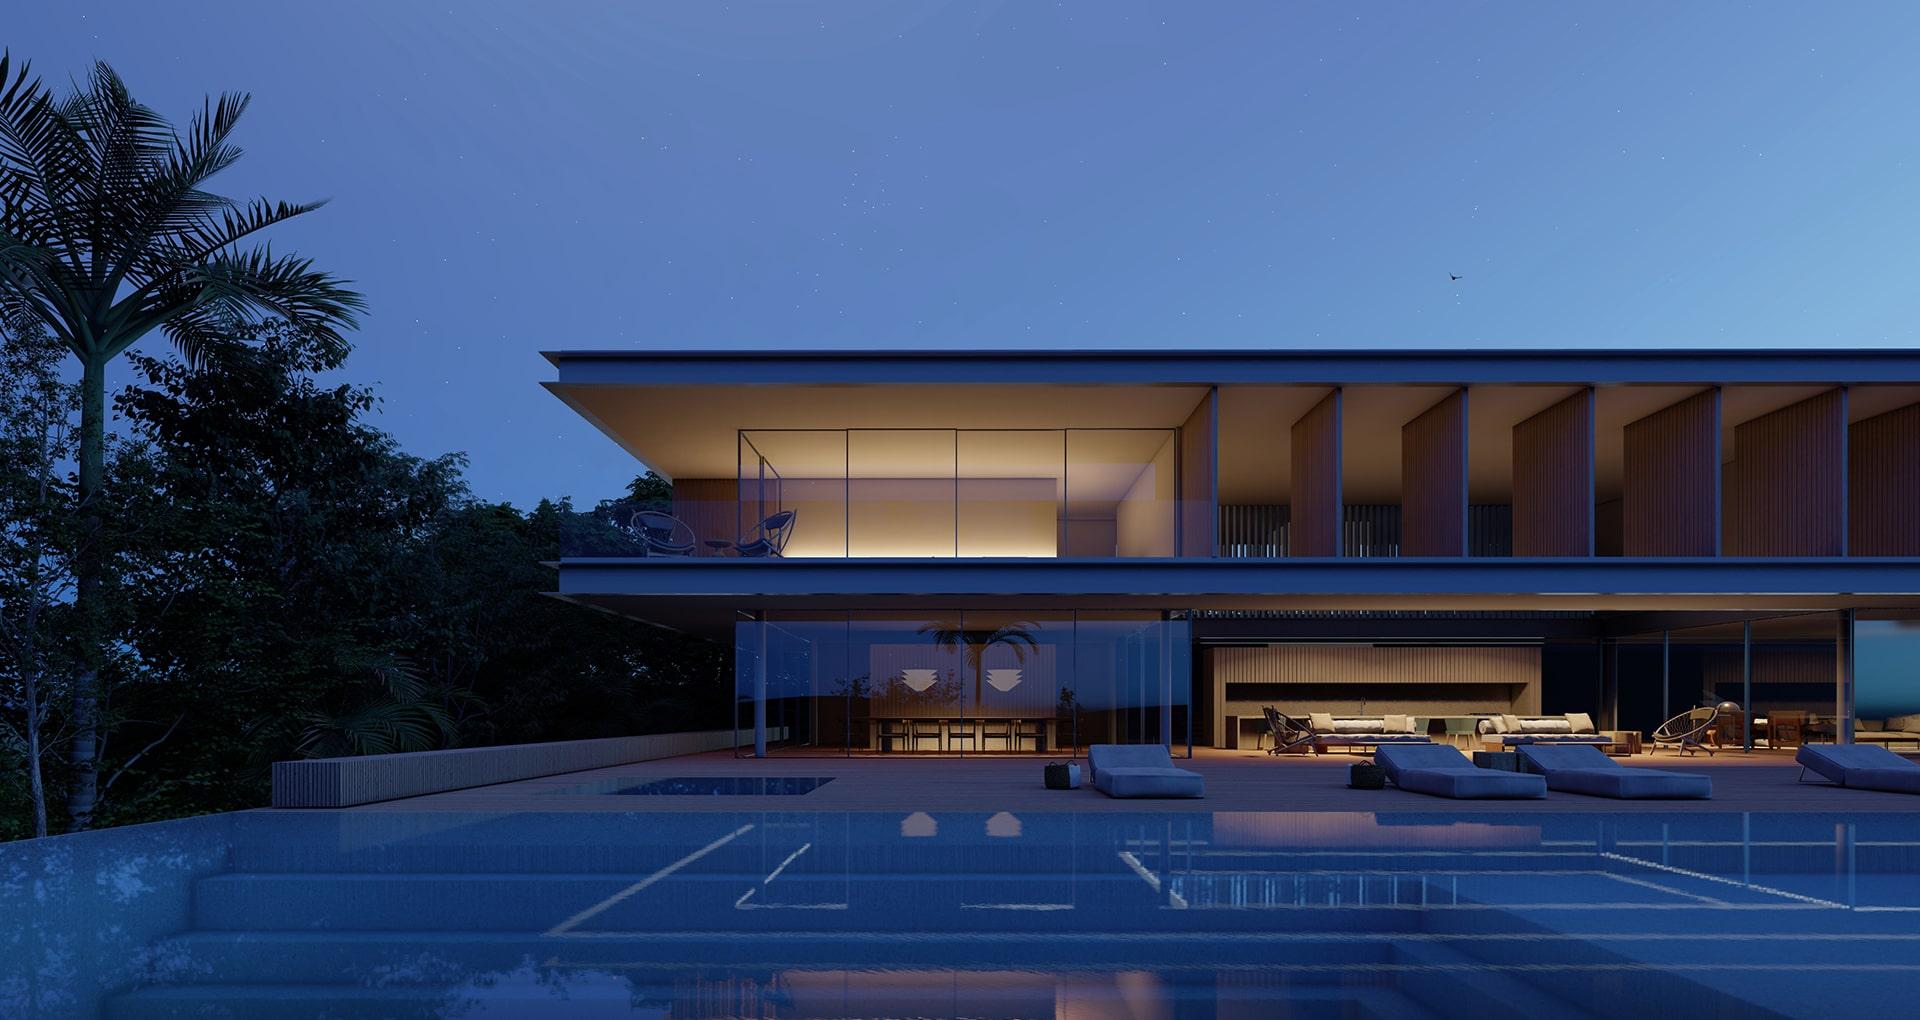 Casa Branca Sabella Arquitetura